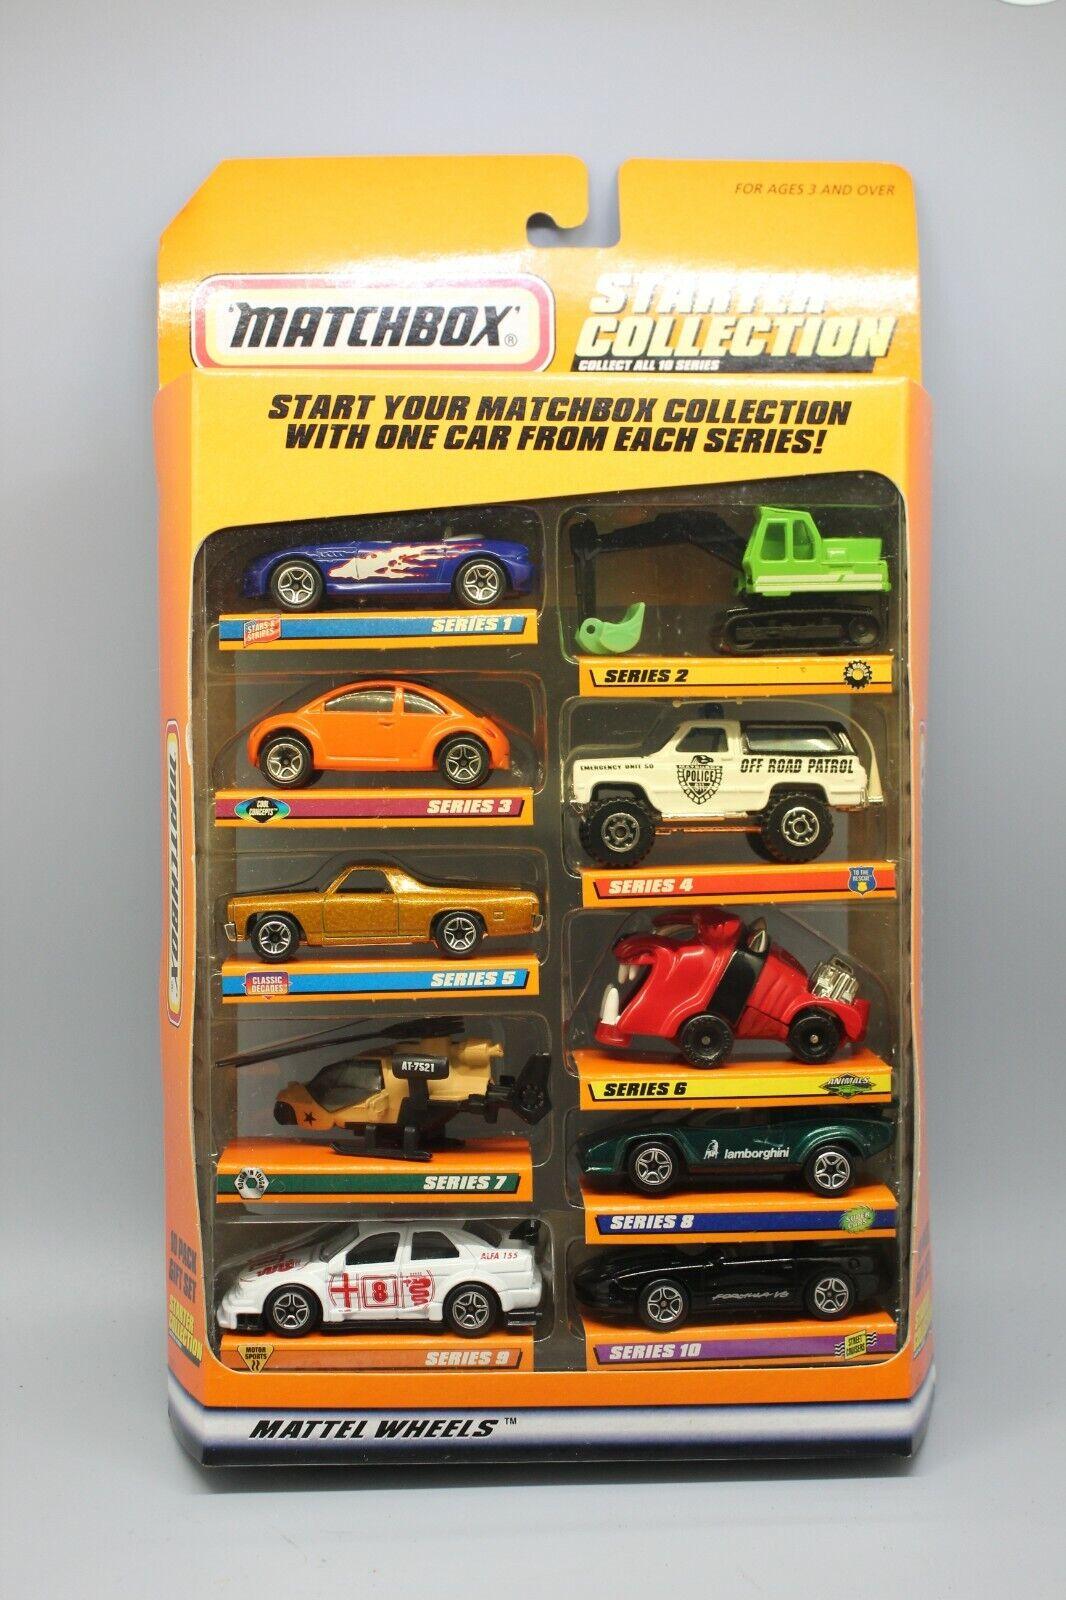 MATCHBOX STARTER COLLECTION #34721 10 CAR SET INCLUDES '70 G